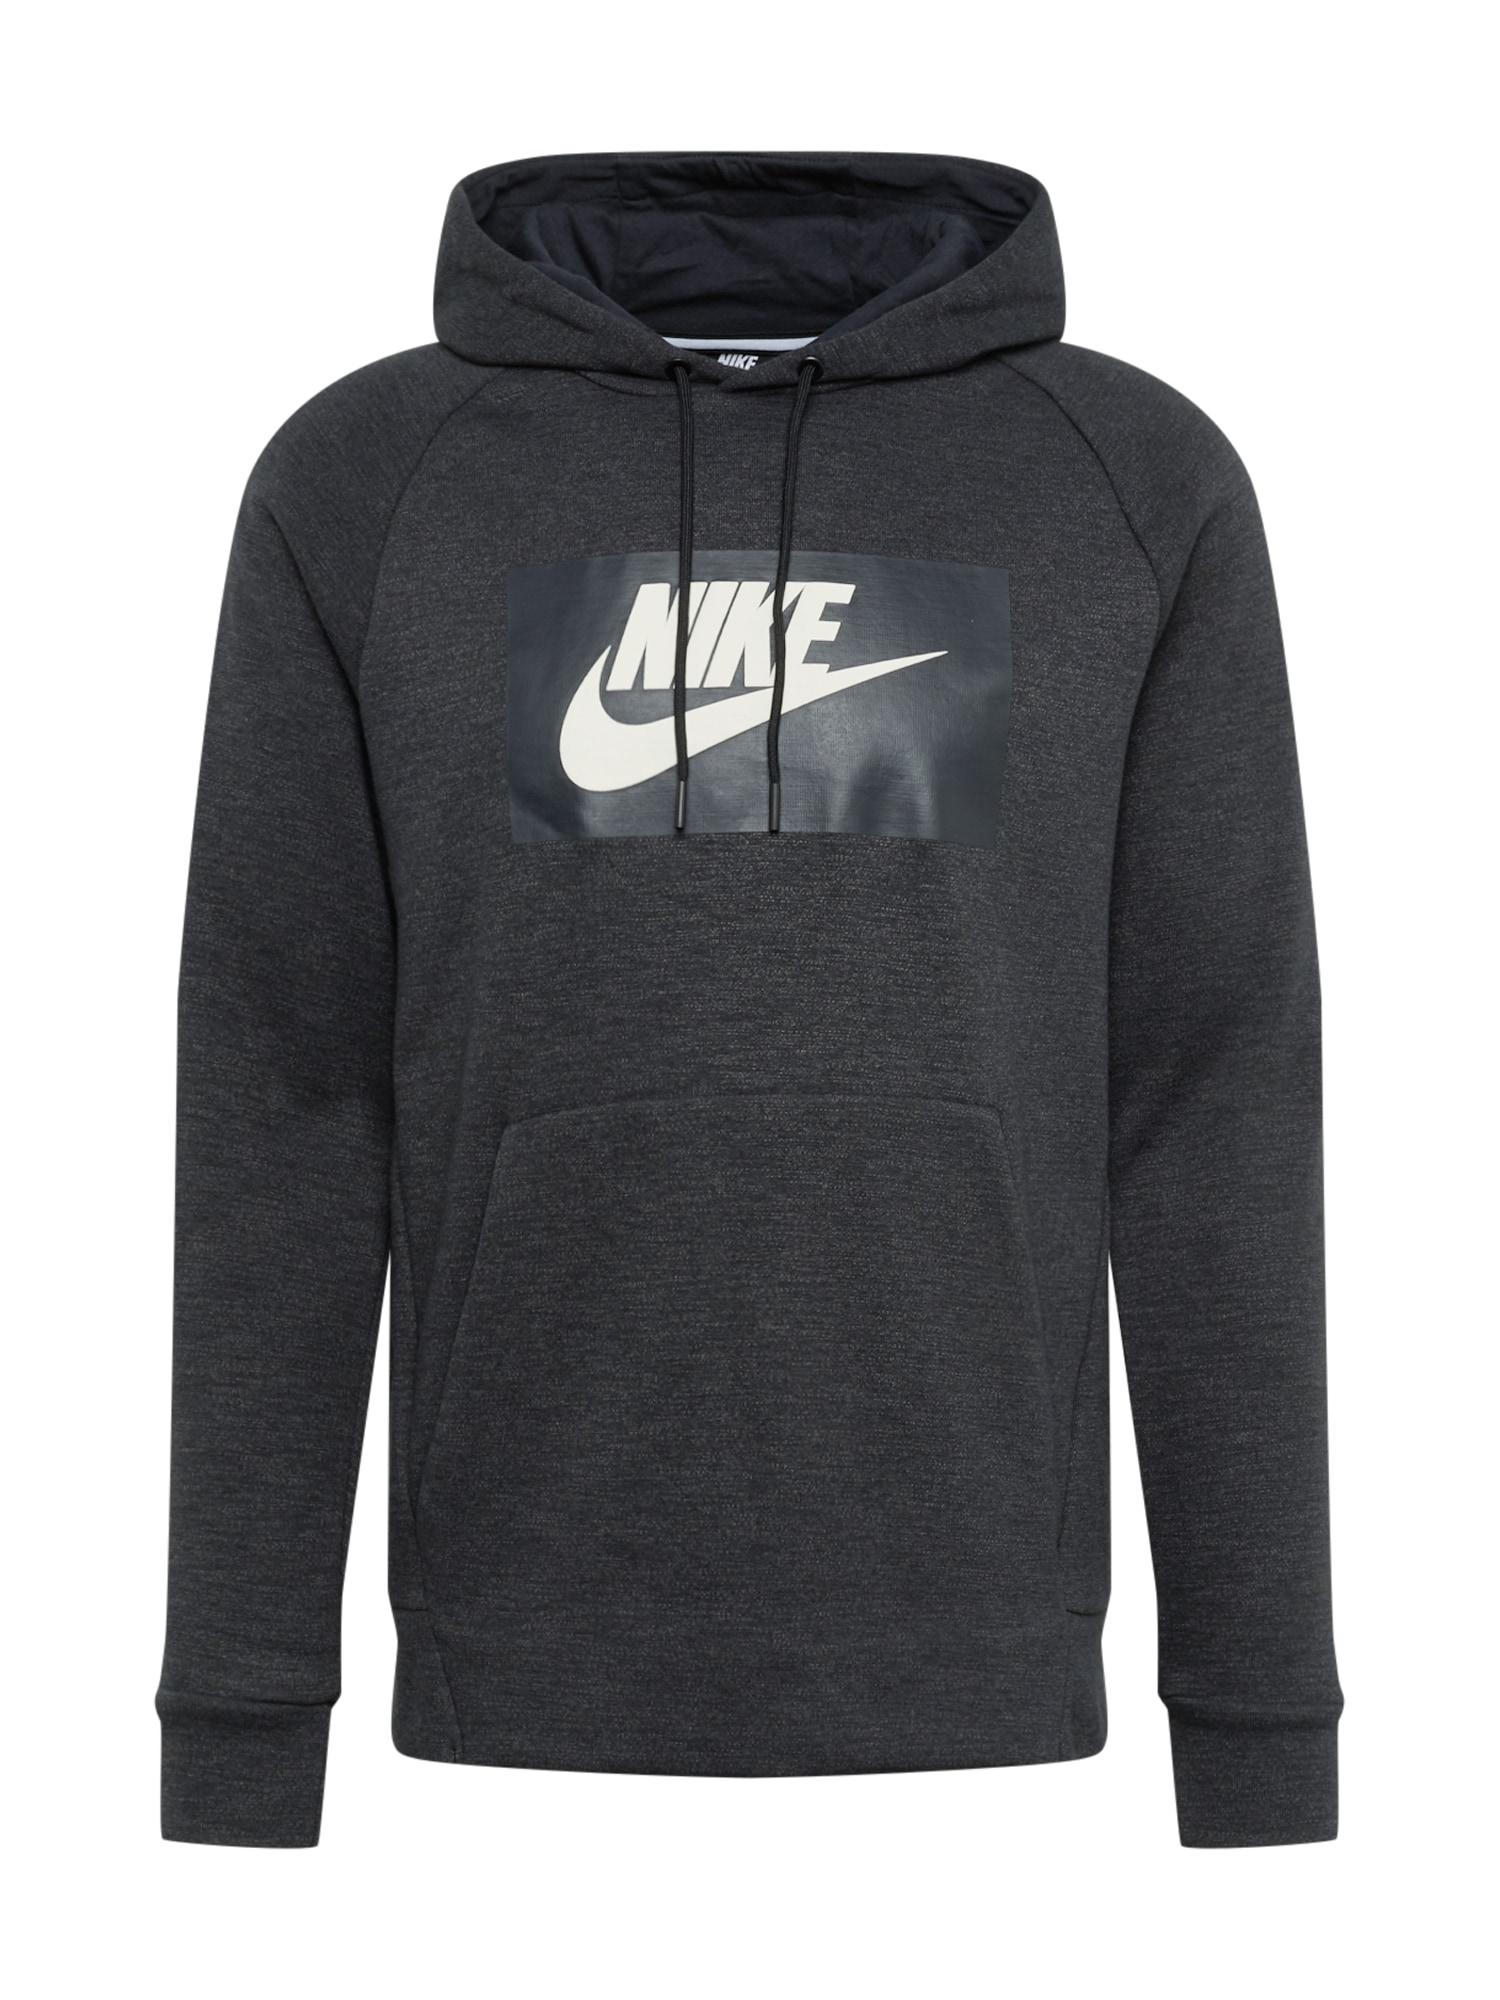 Nike Sportswear Mikina 'OPTIC'  biela / čierna